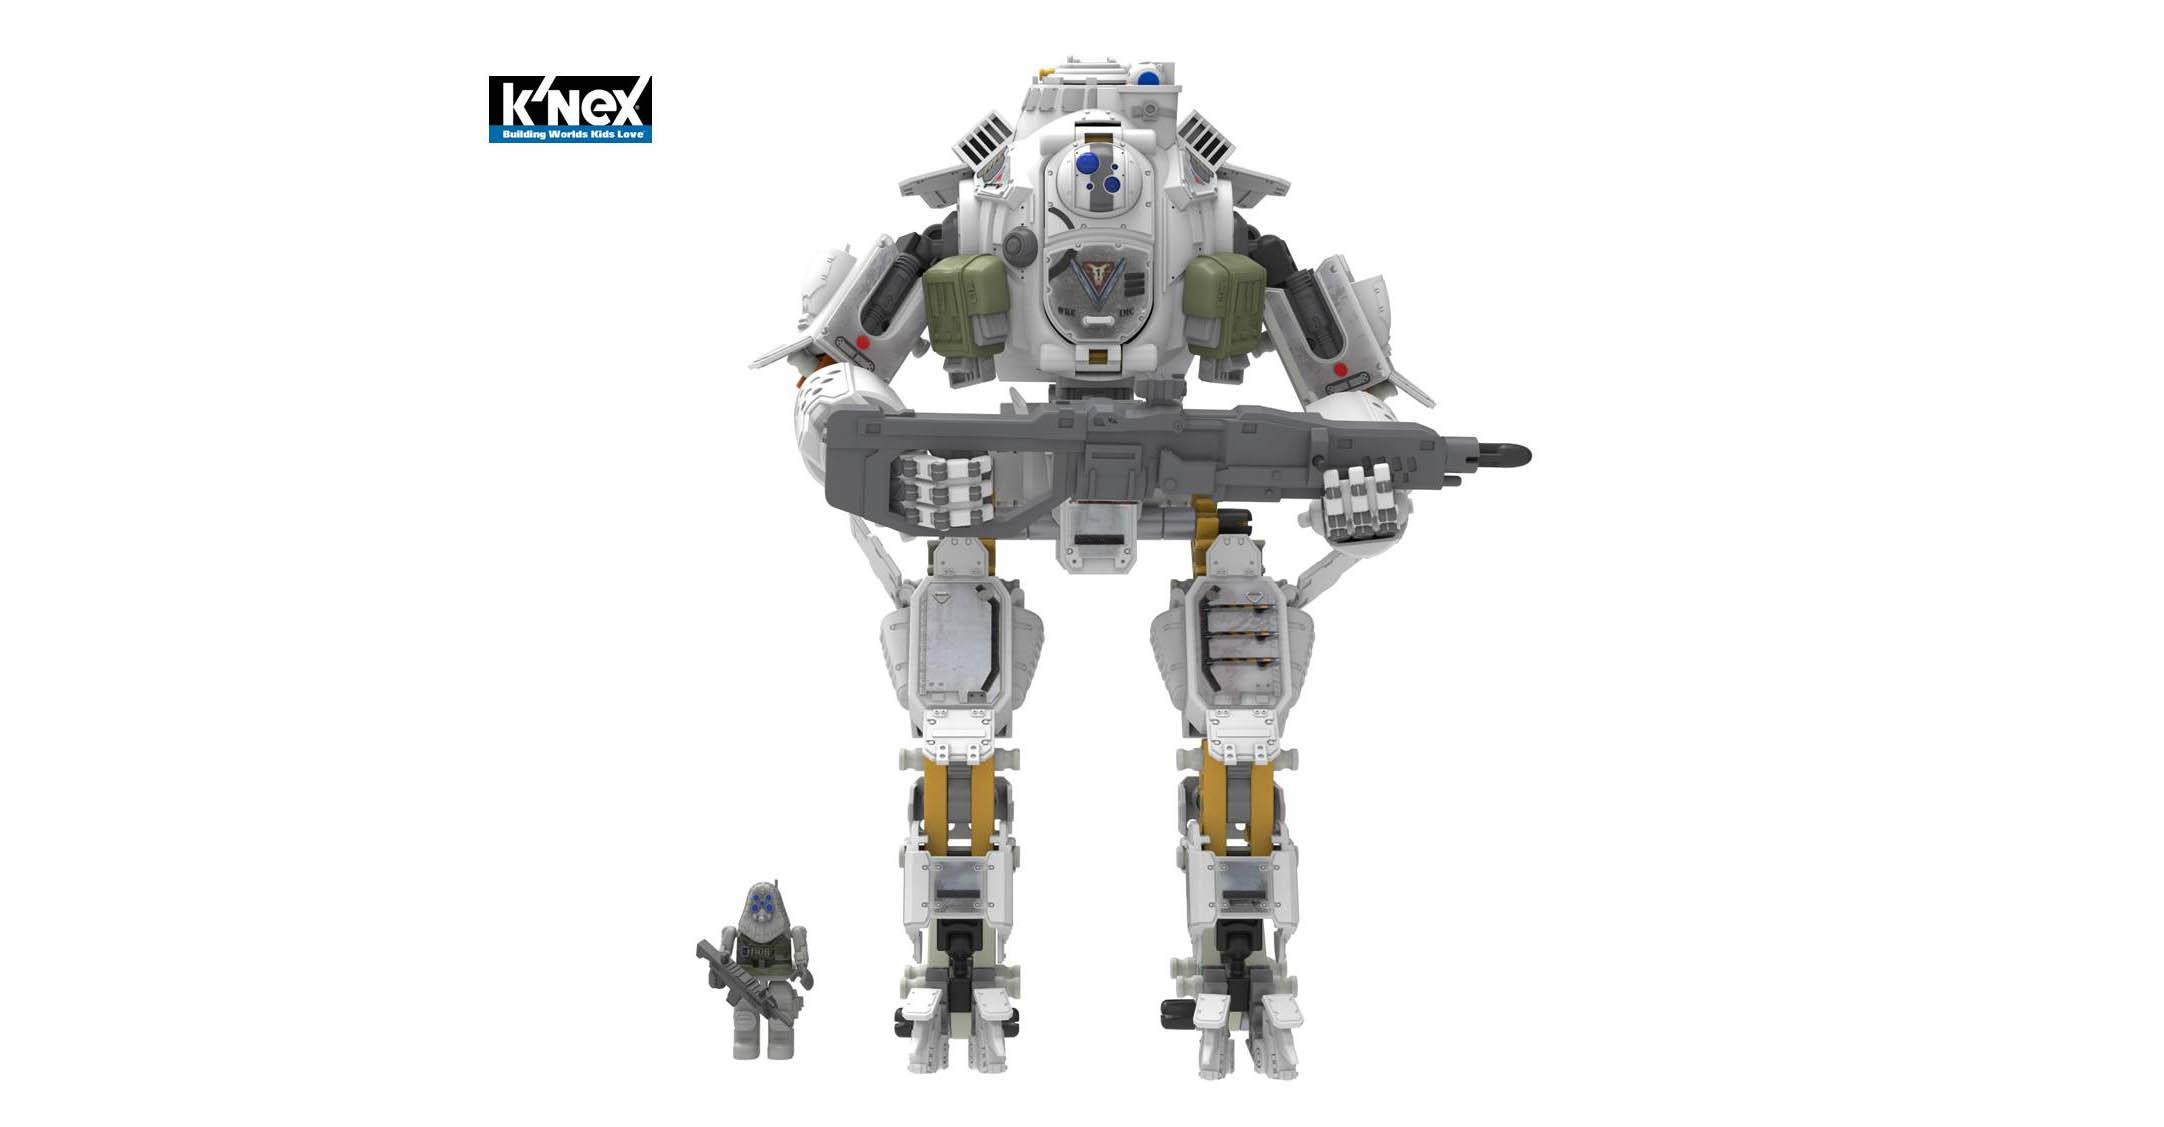 K Nex Titanfall Toys Drop In At London Toy Fair